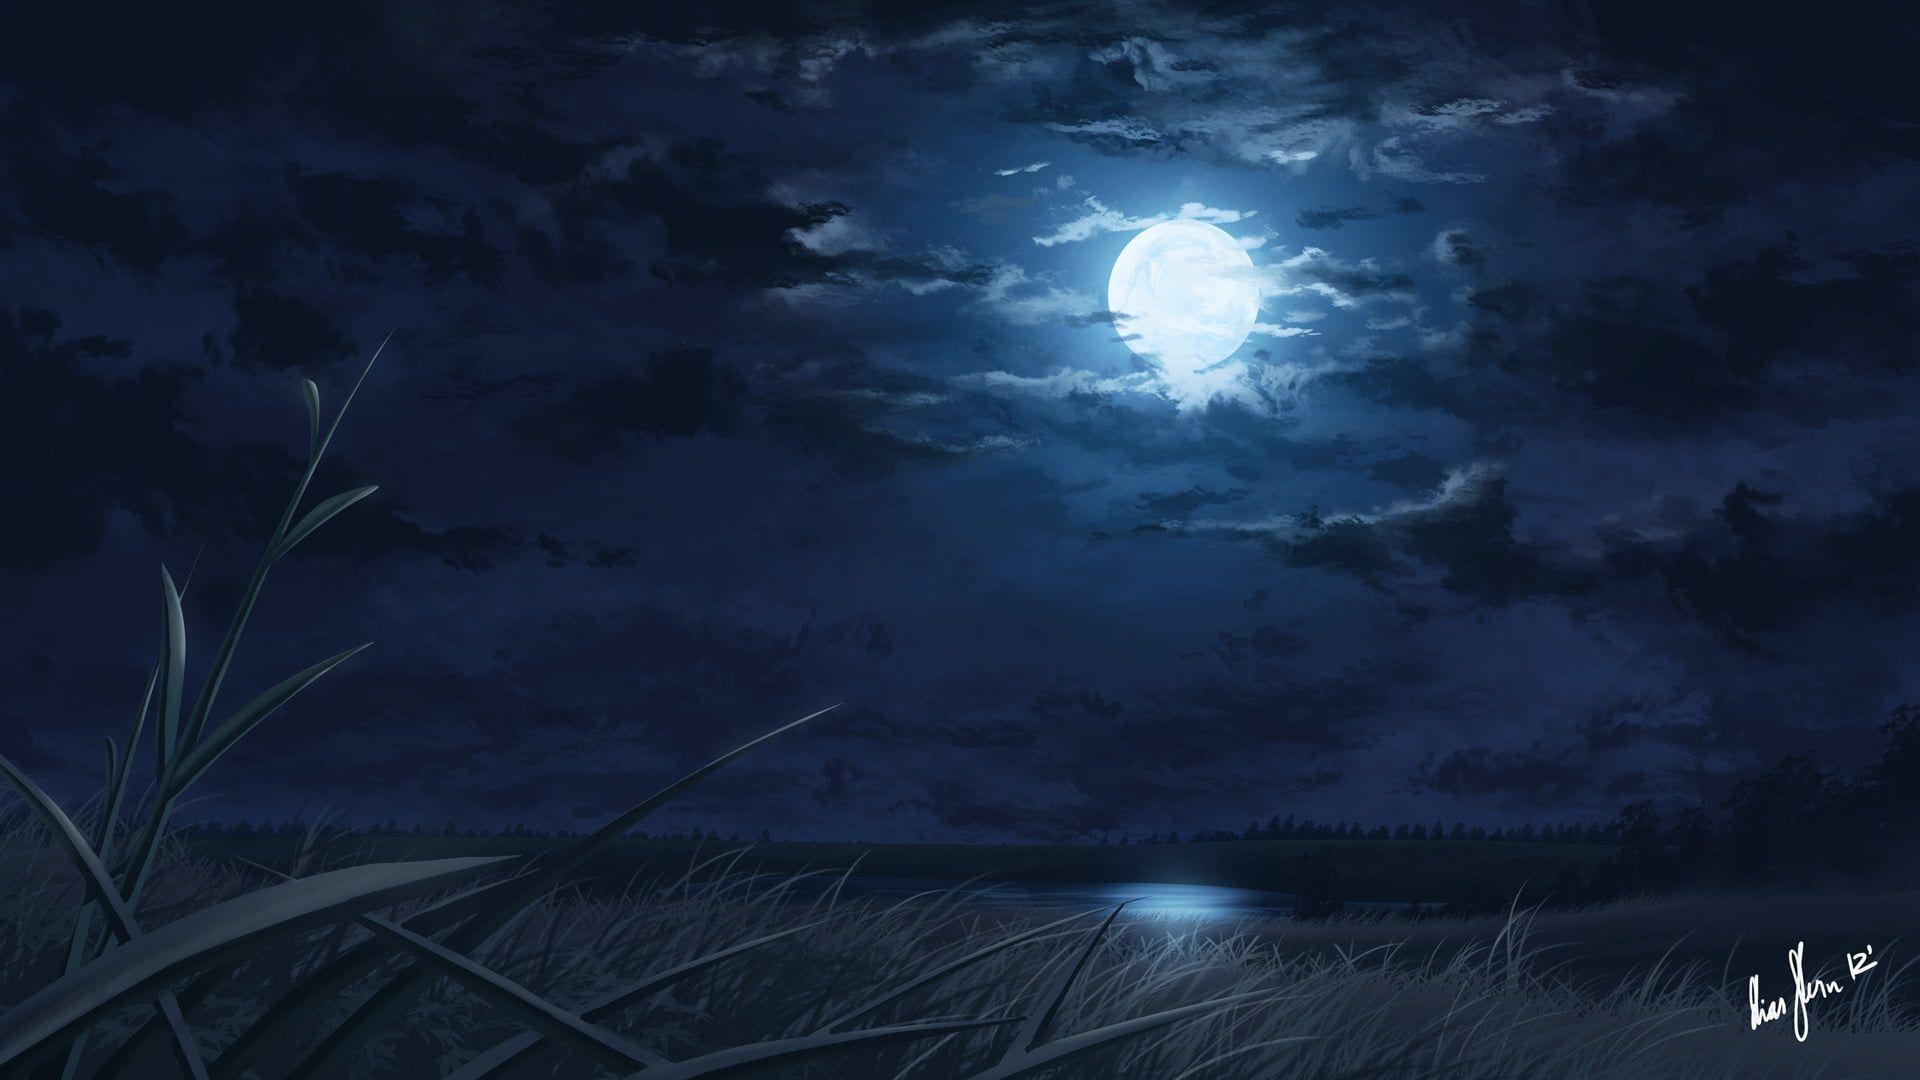 Full Moon Painting Night Moon Moonlight Lake Reeds Landscape Digital Art 1080p Wallpaper Hdwallpaper Desktop Moon Sea Moon Painting Anime Scenery